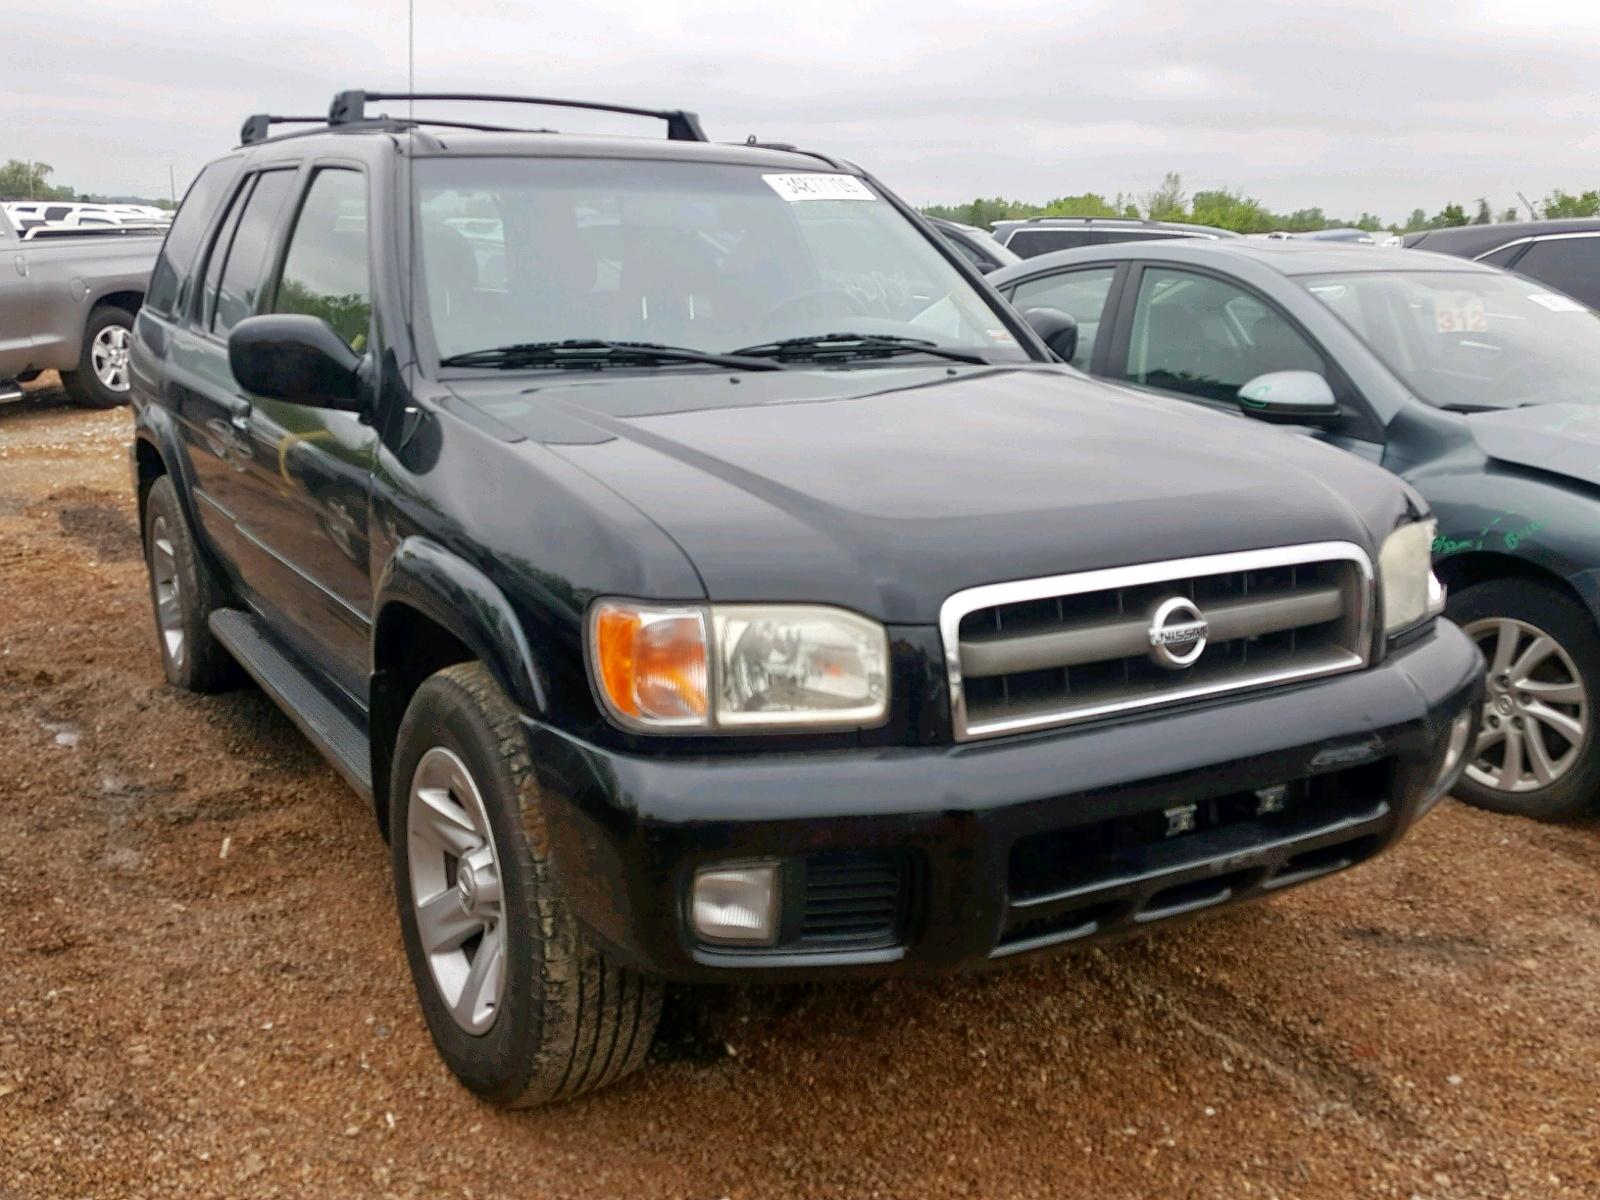 Salvage 2002 Nissan PATHFINDER for sale